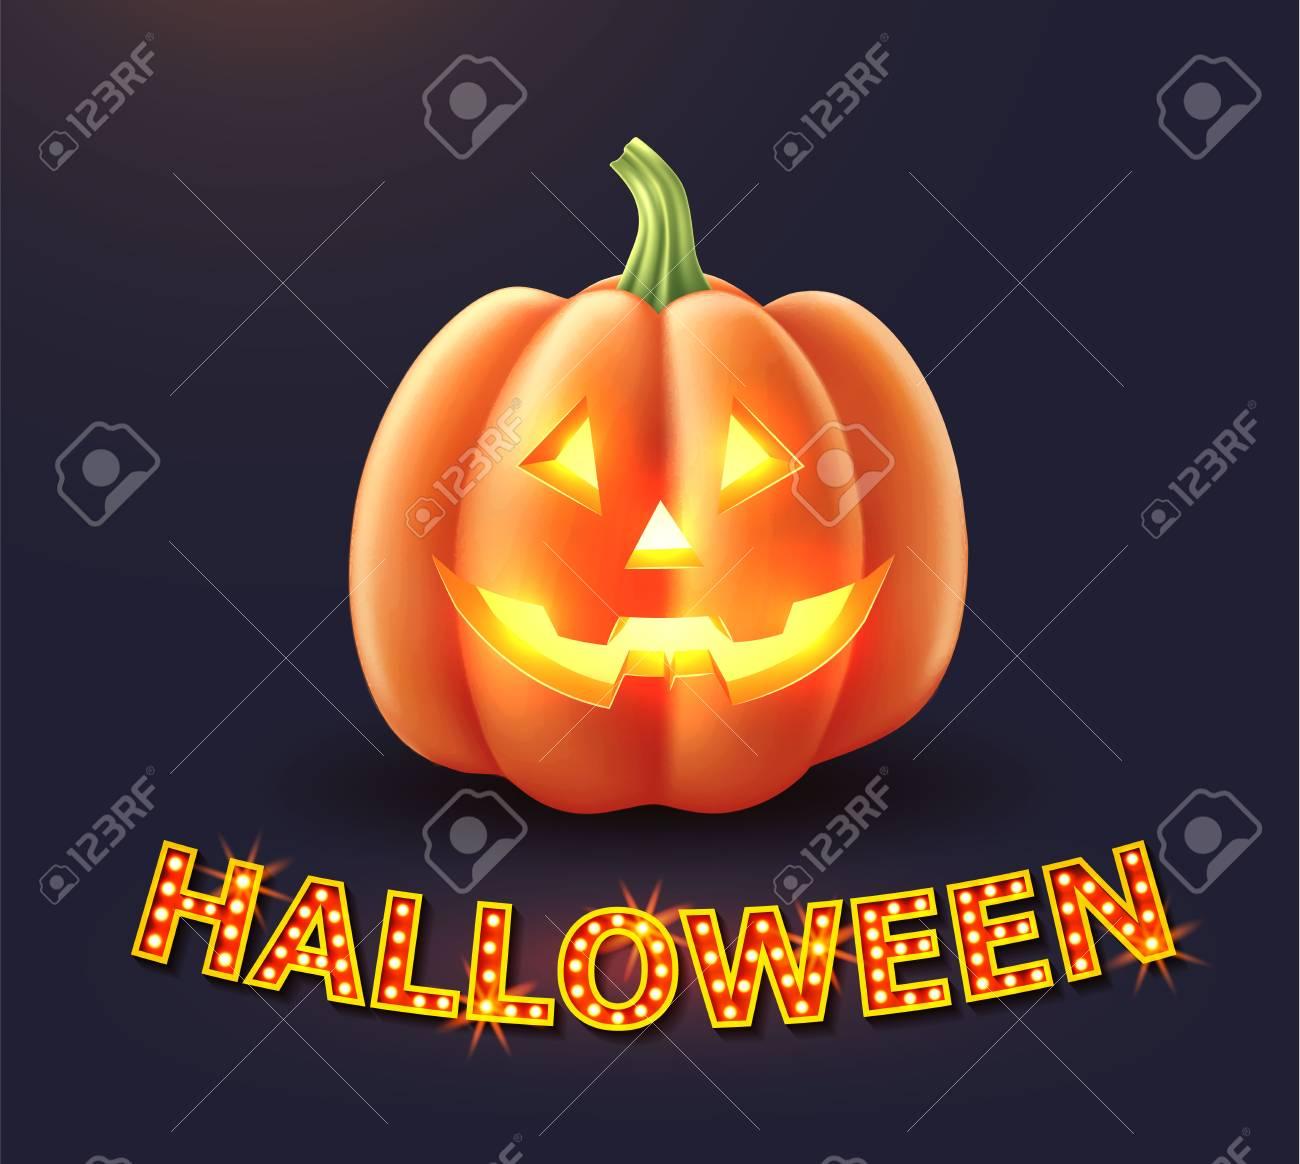 Vector Jack O Lanterns Scary Pumpkin Face Halloween Holiday Realistic Royalty Free Cliparts Vectors And Stock Illustration Image 111492942